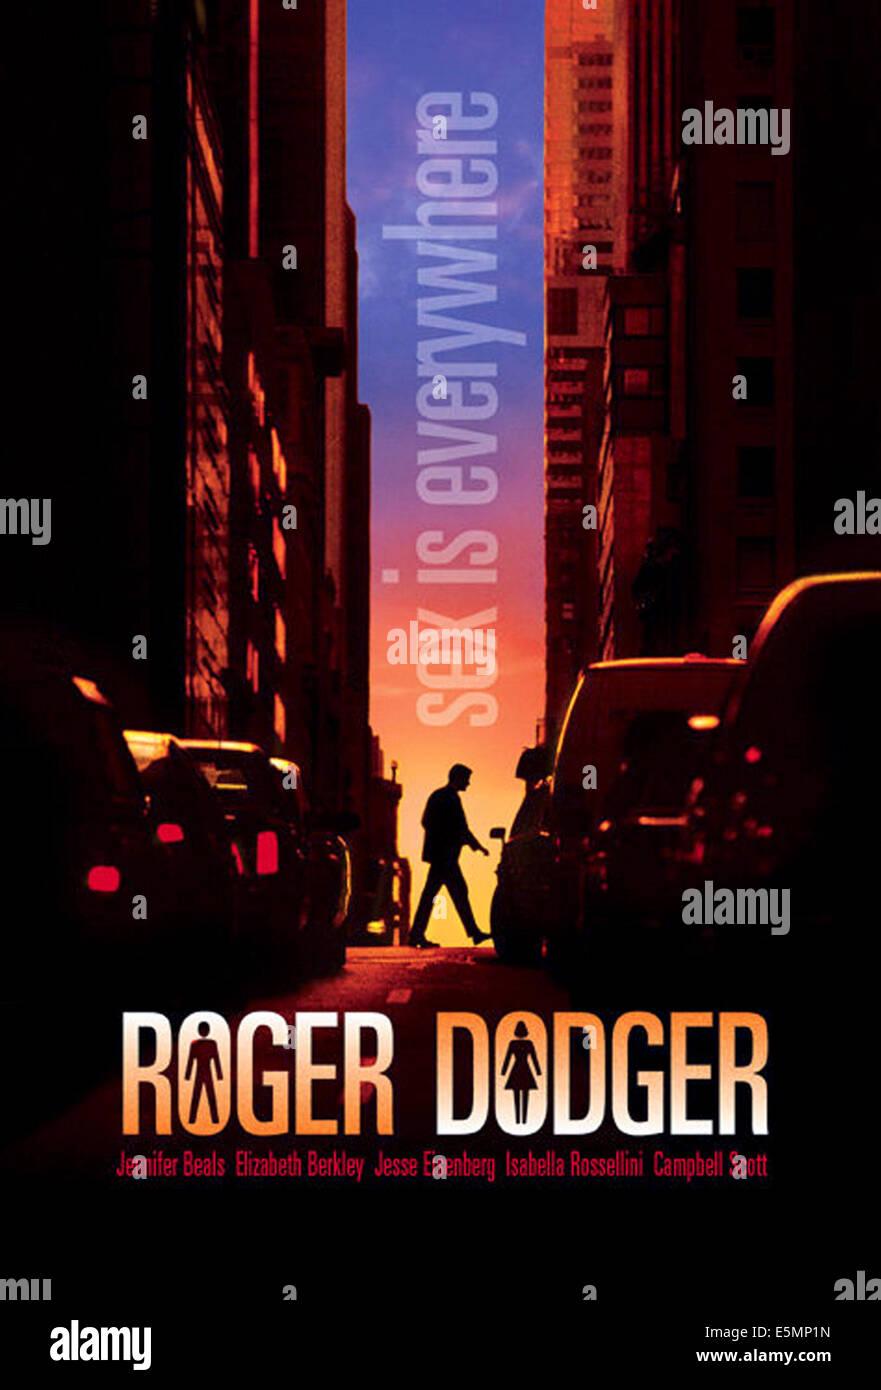 ROGER DODGER, 2002, © Artisan Entertainment/courtesy Everett Collection - Stock Image